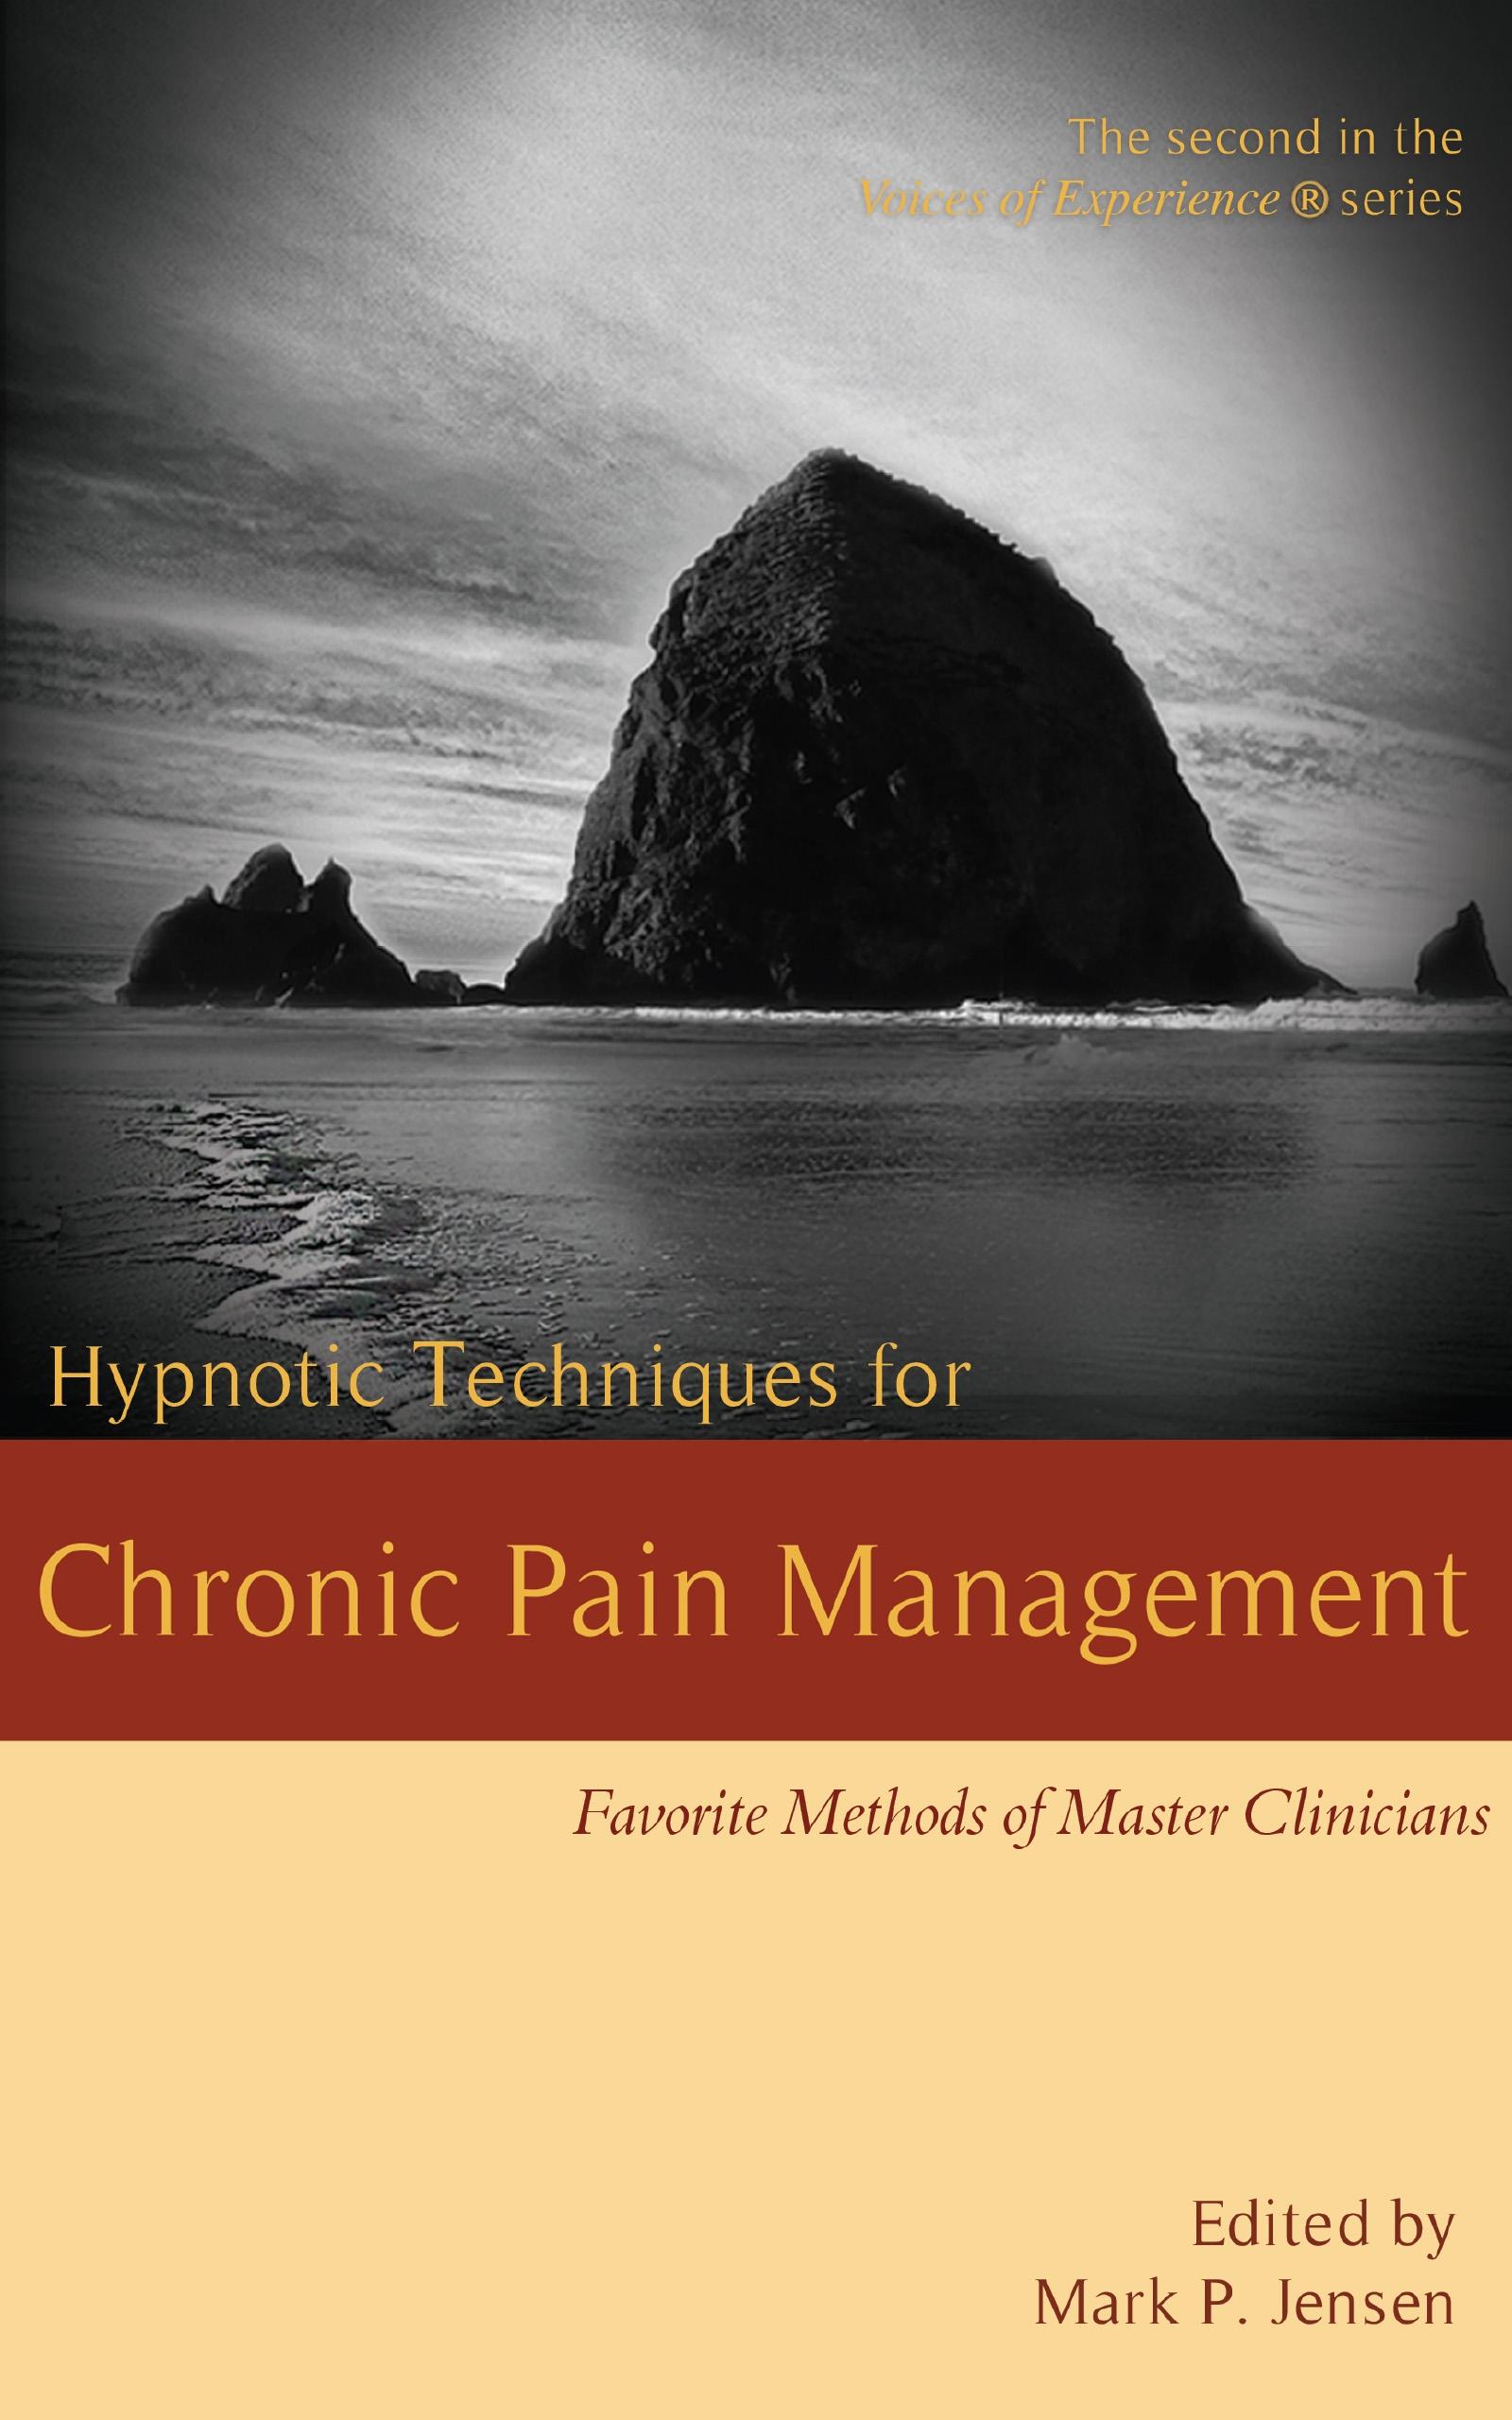 Book 2 Chronic Pain final_ebook CVR.jpg